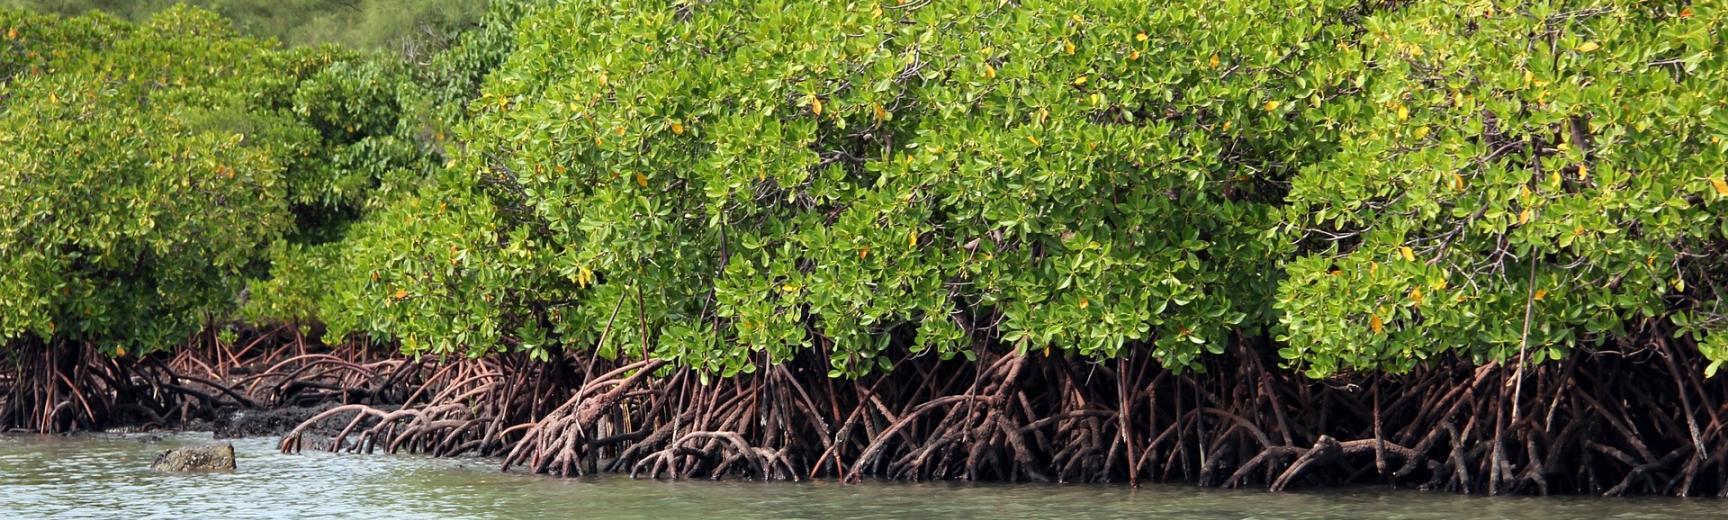 mangrove 798578